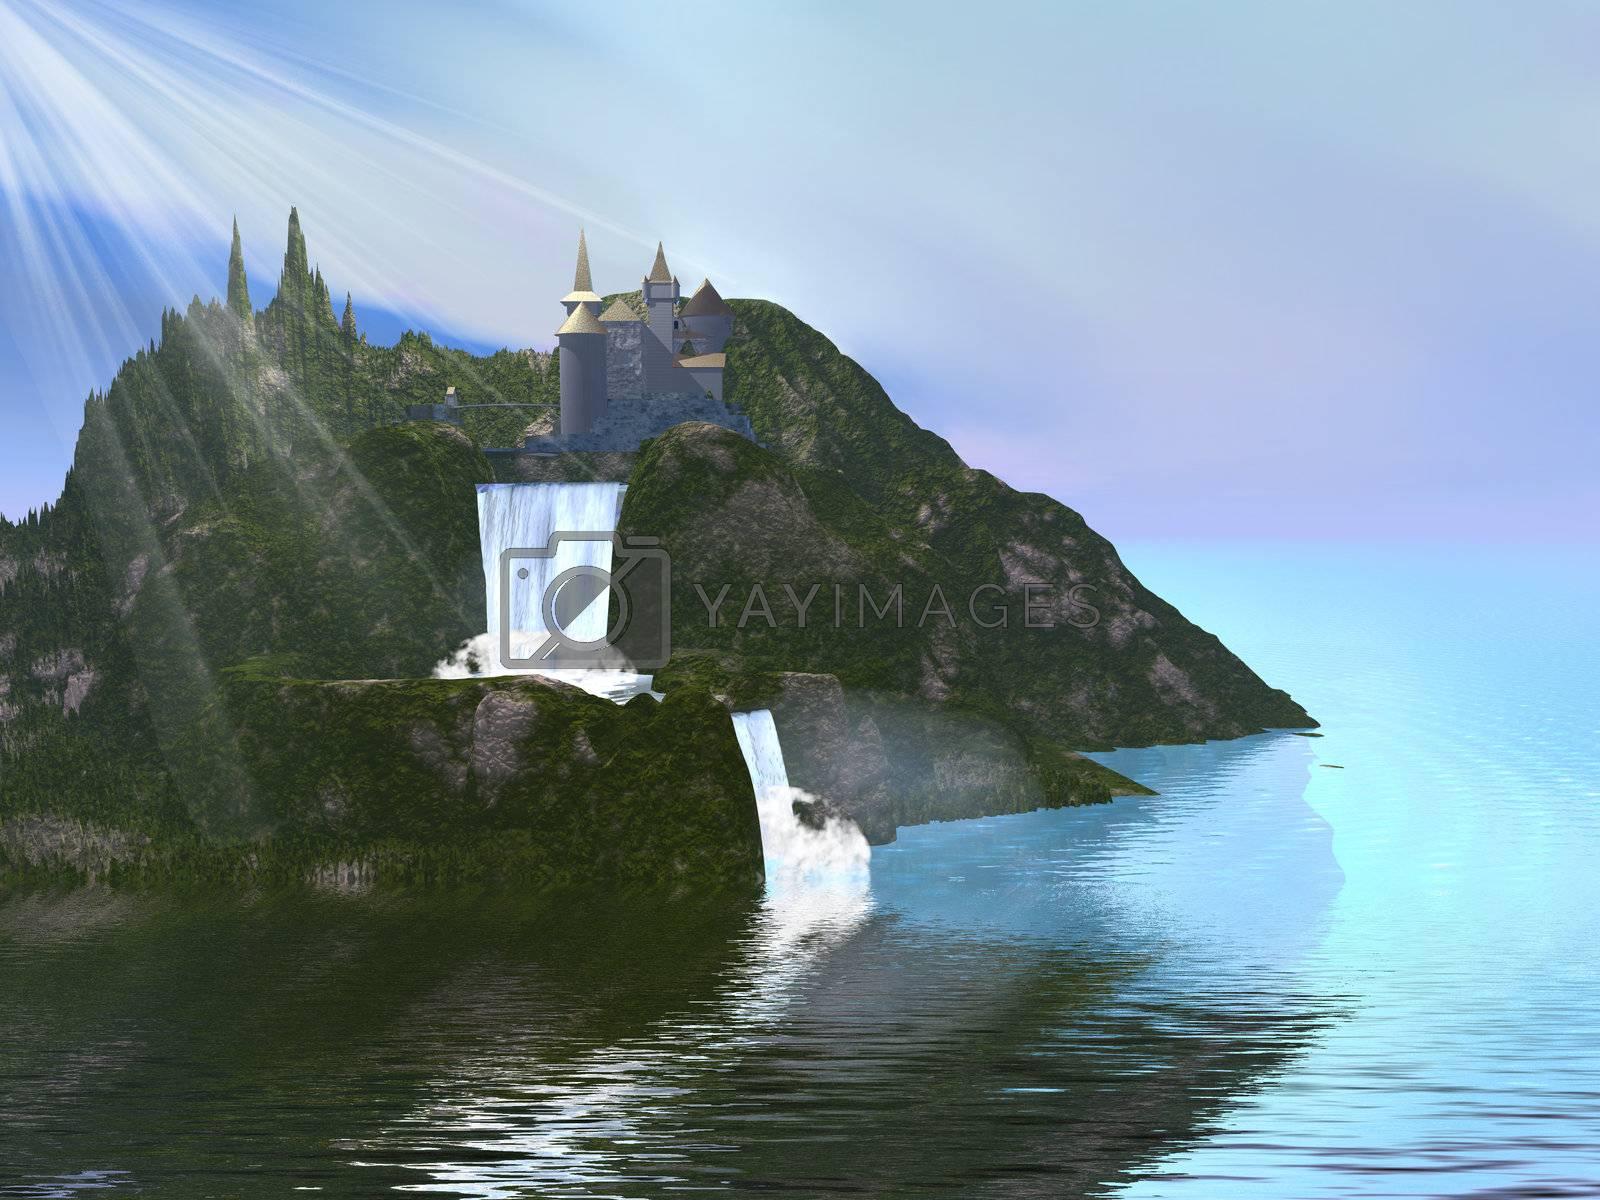 A fairytale castle sits among beautiful waterfalls.